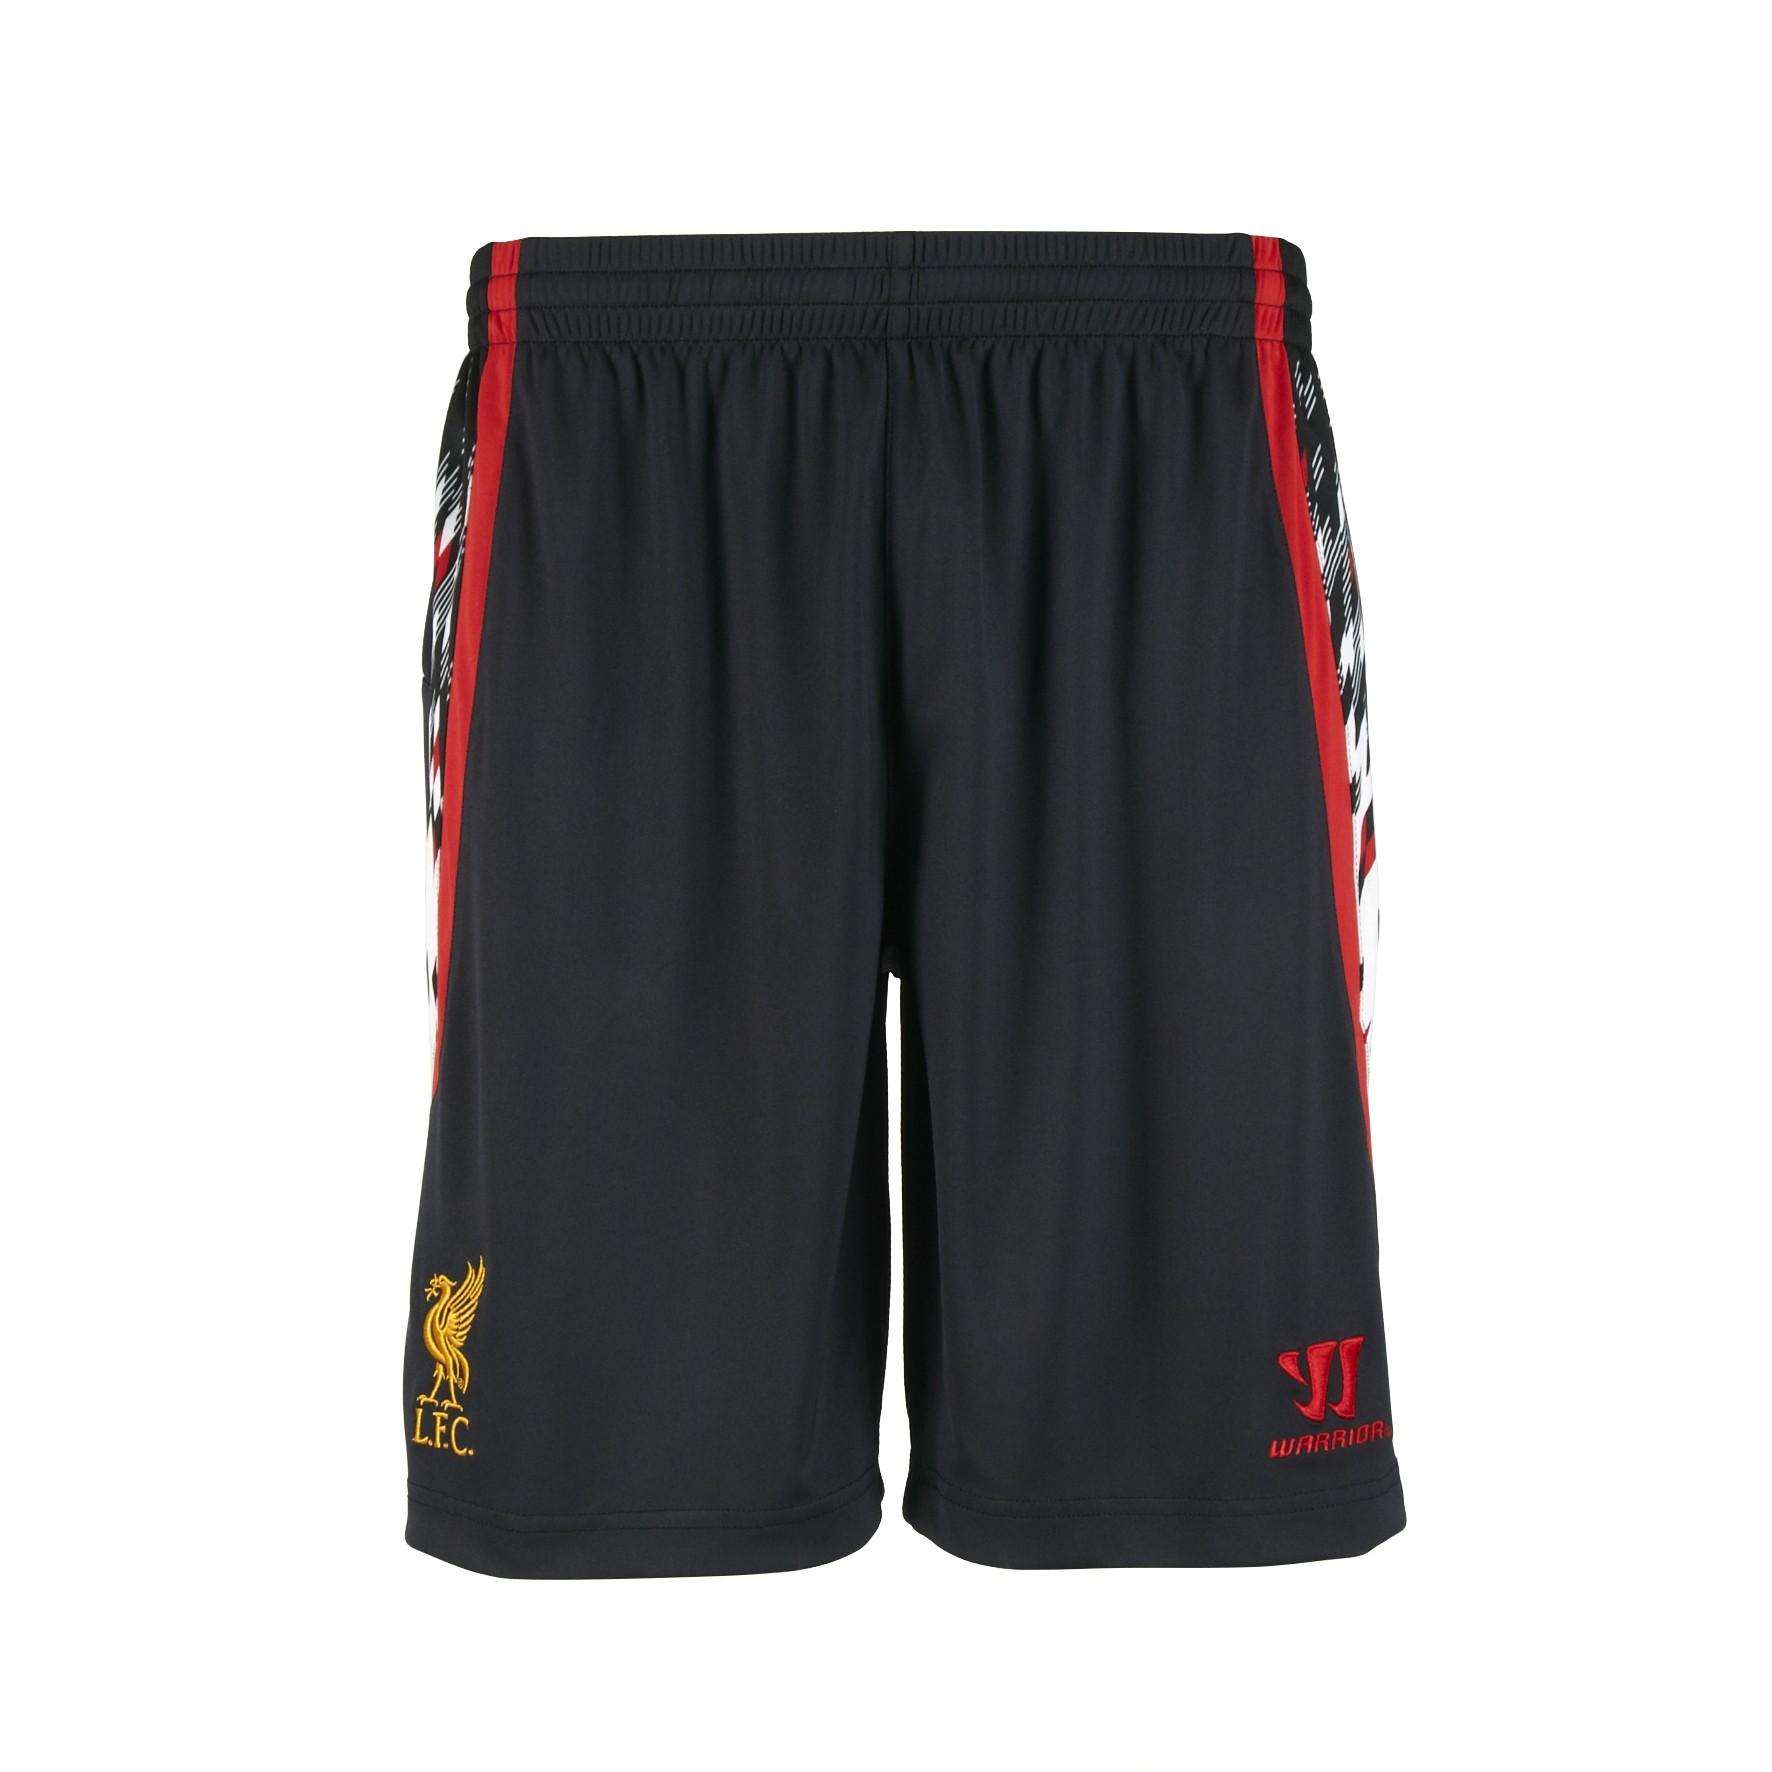 Liverpool FC short junior 2013/14